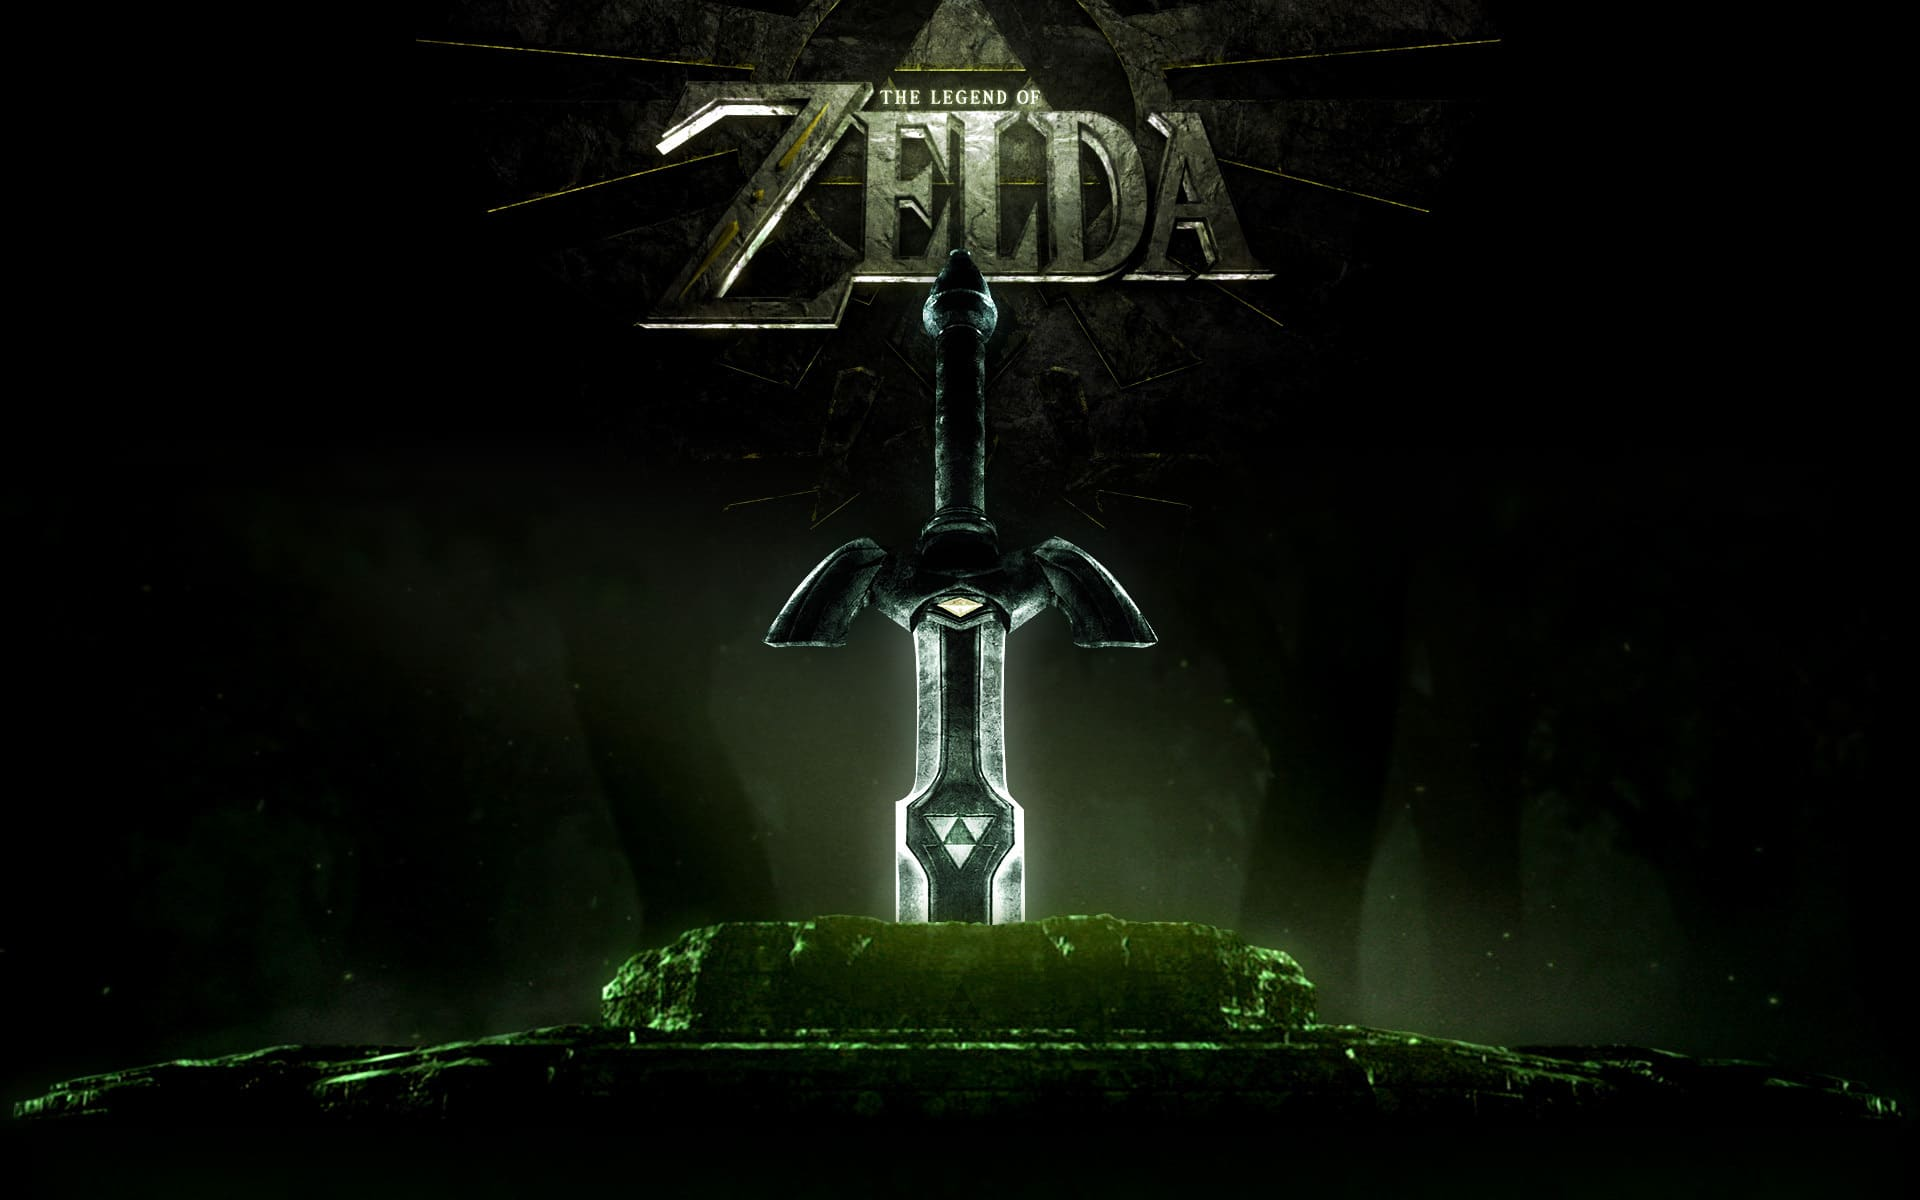 Top 10 Video Game Series Header Image